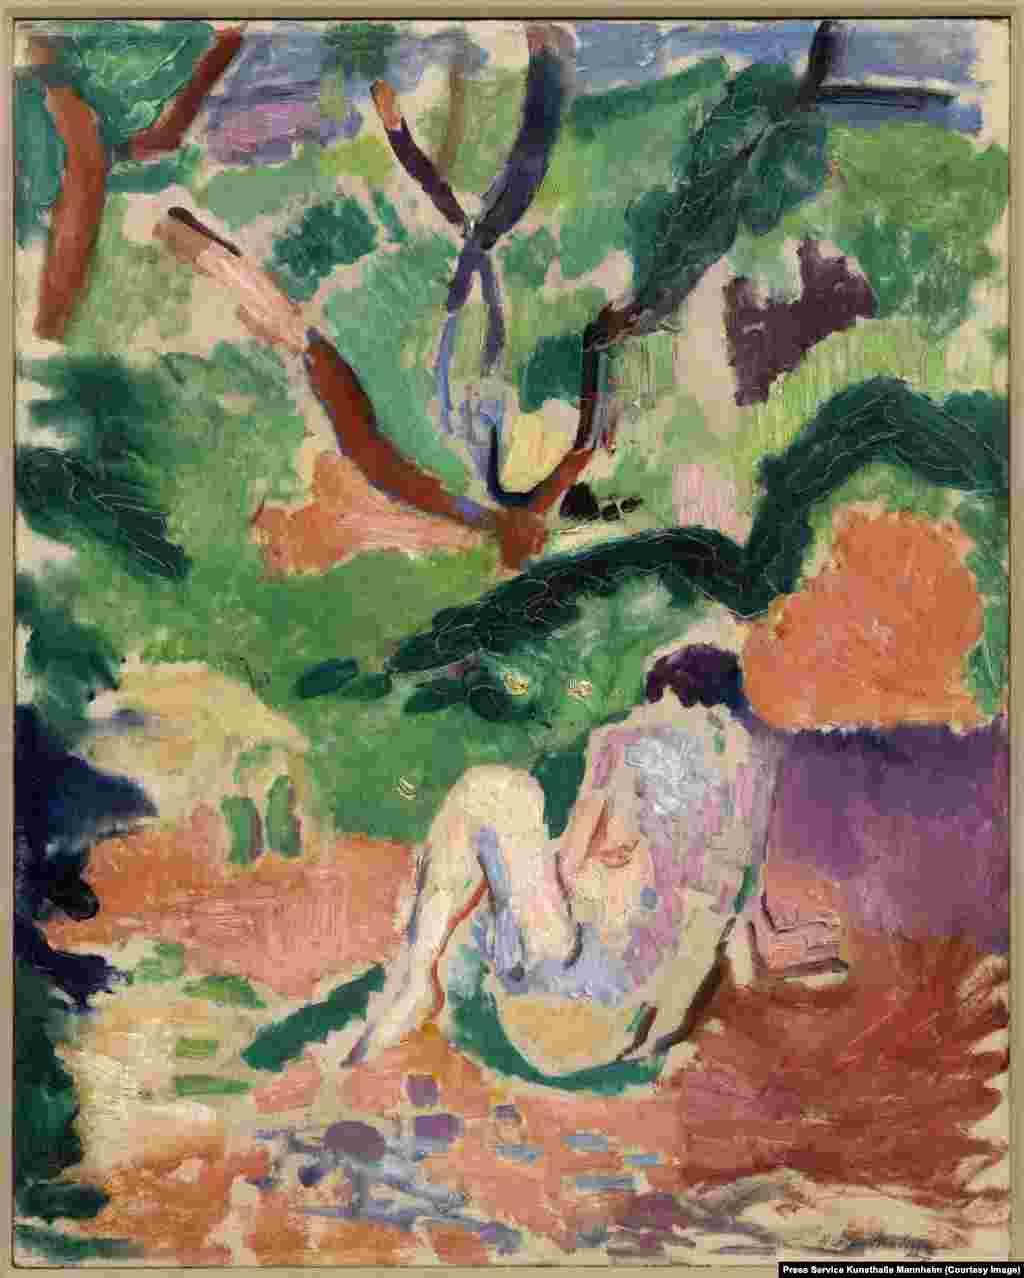 Matisse, Nud în pădure, 1906 (Brooklyn Museum).